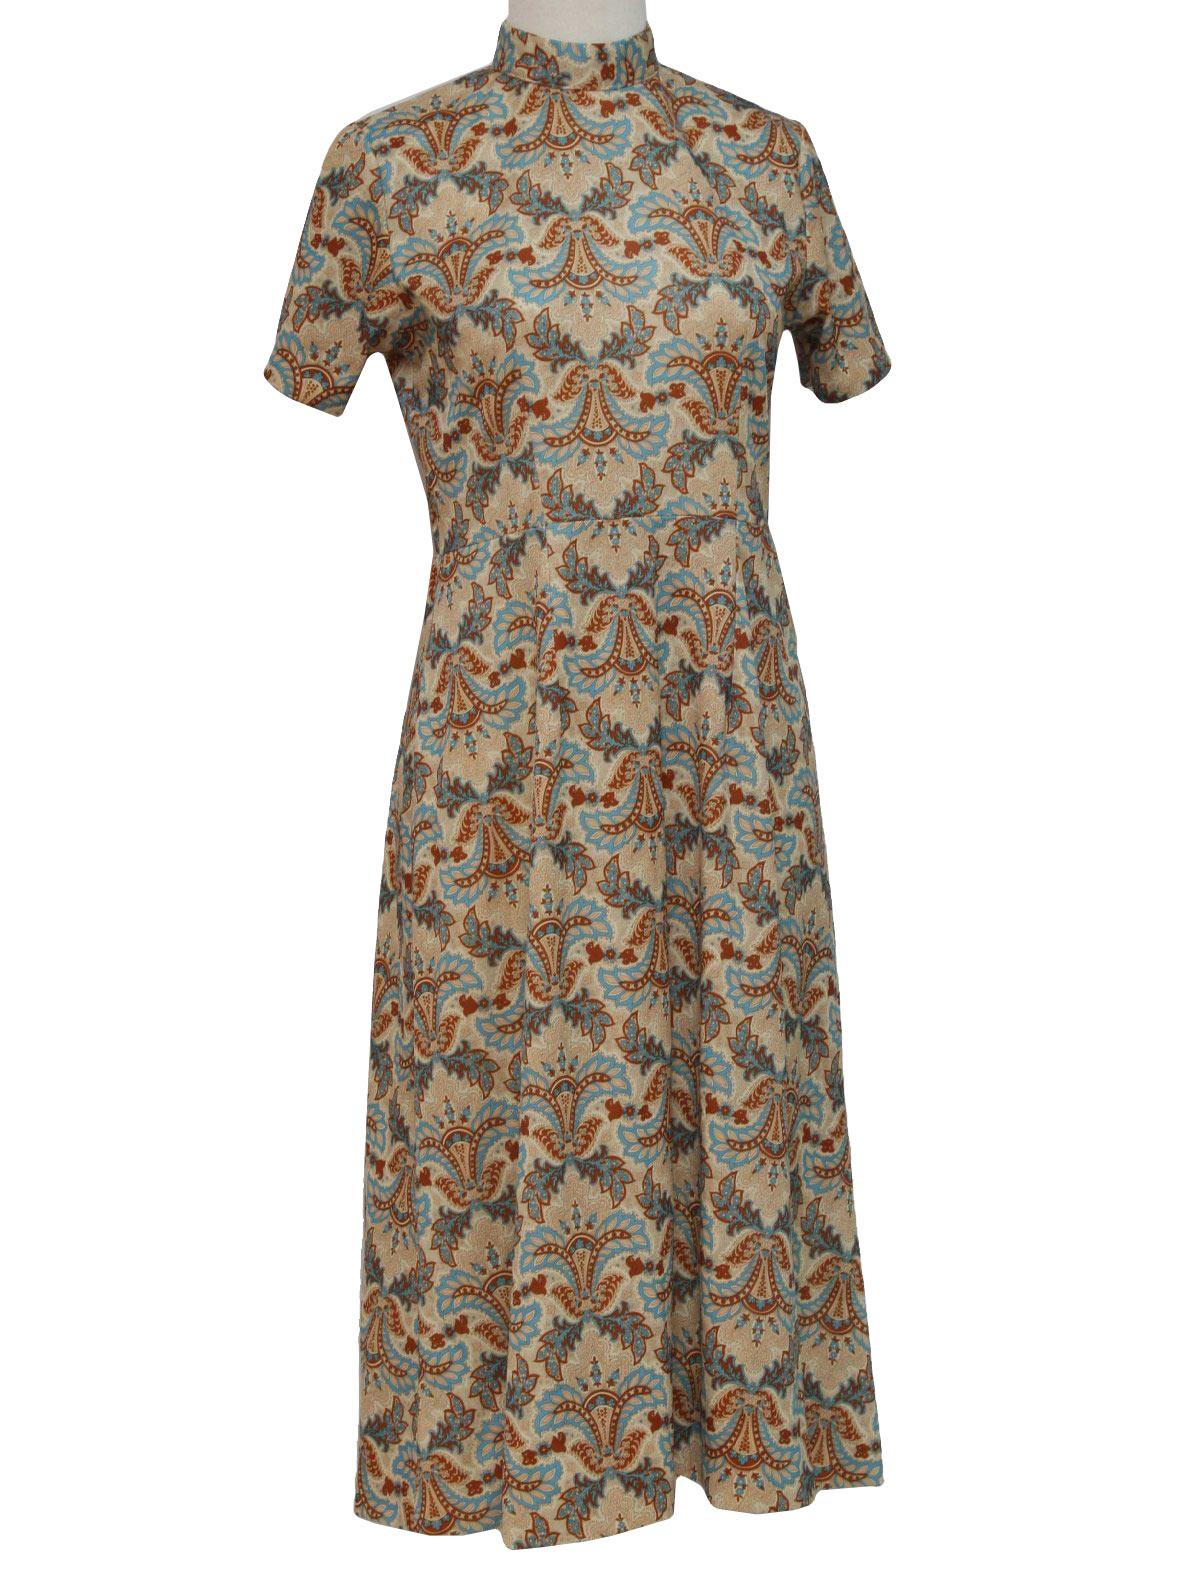 1970s Formal Dress 1970s mod maxi.